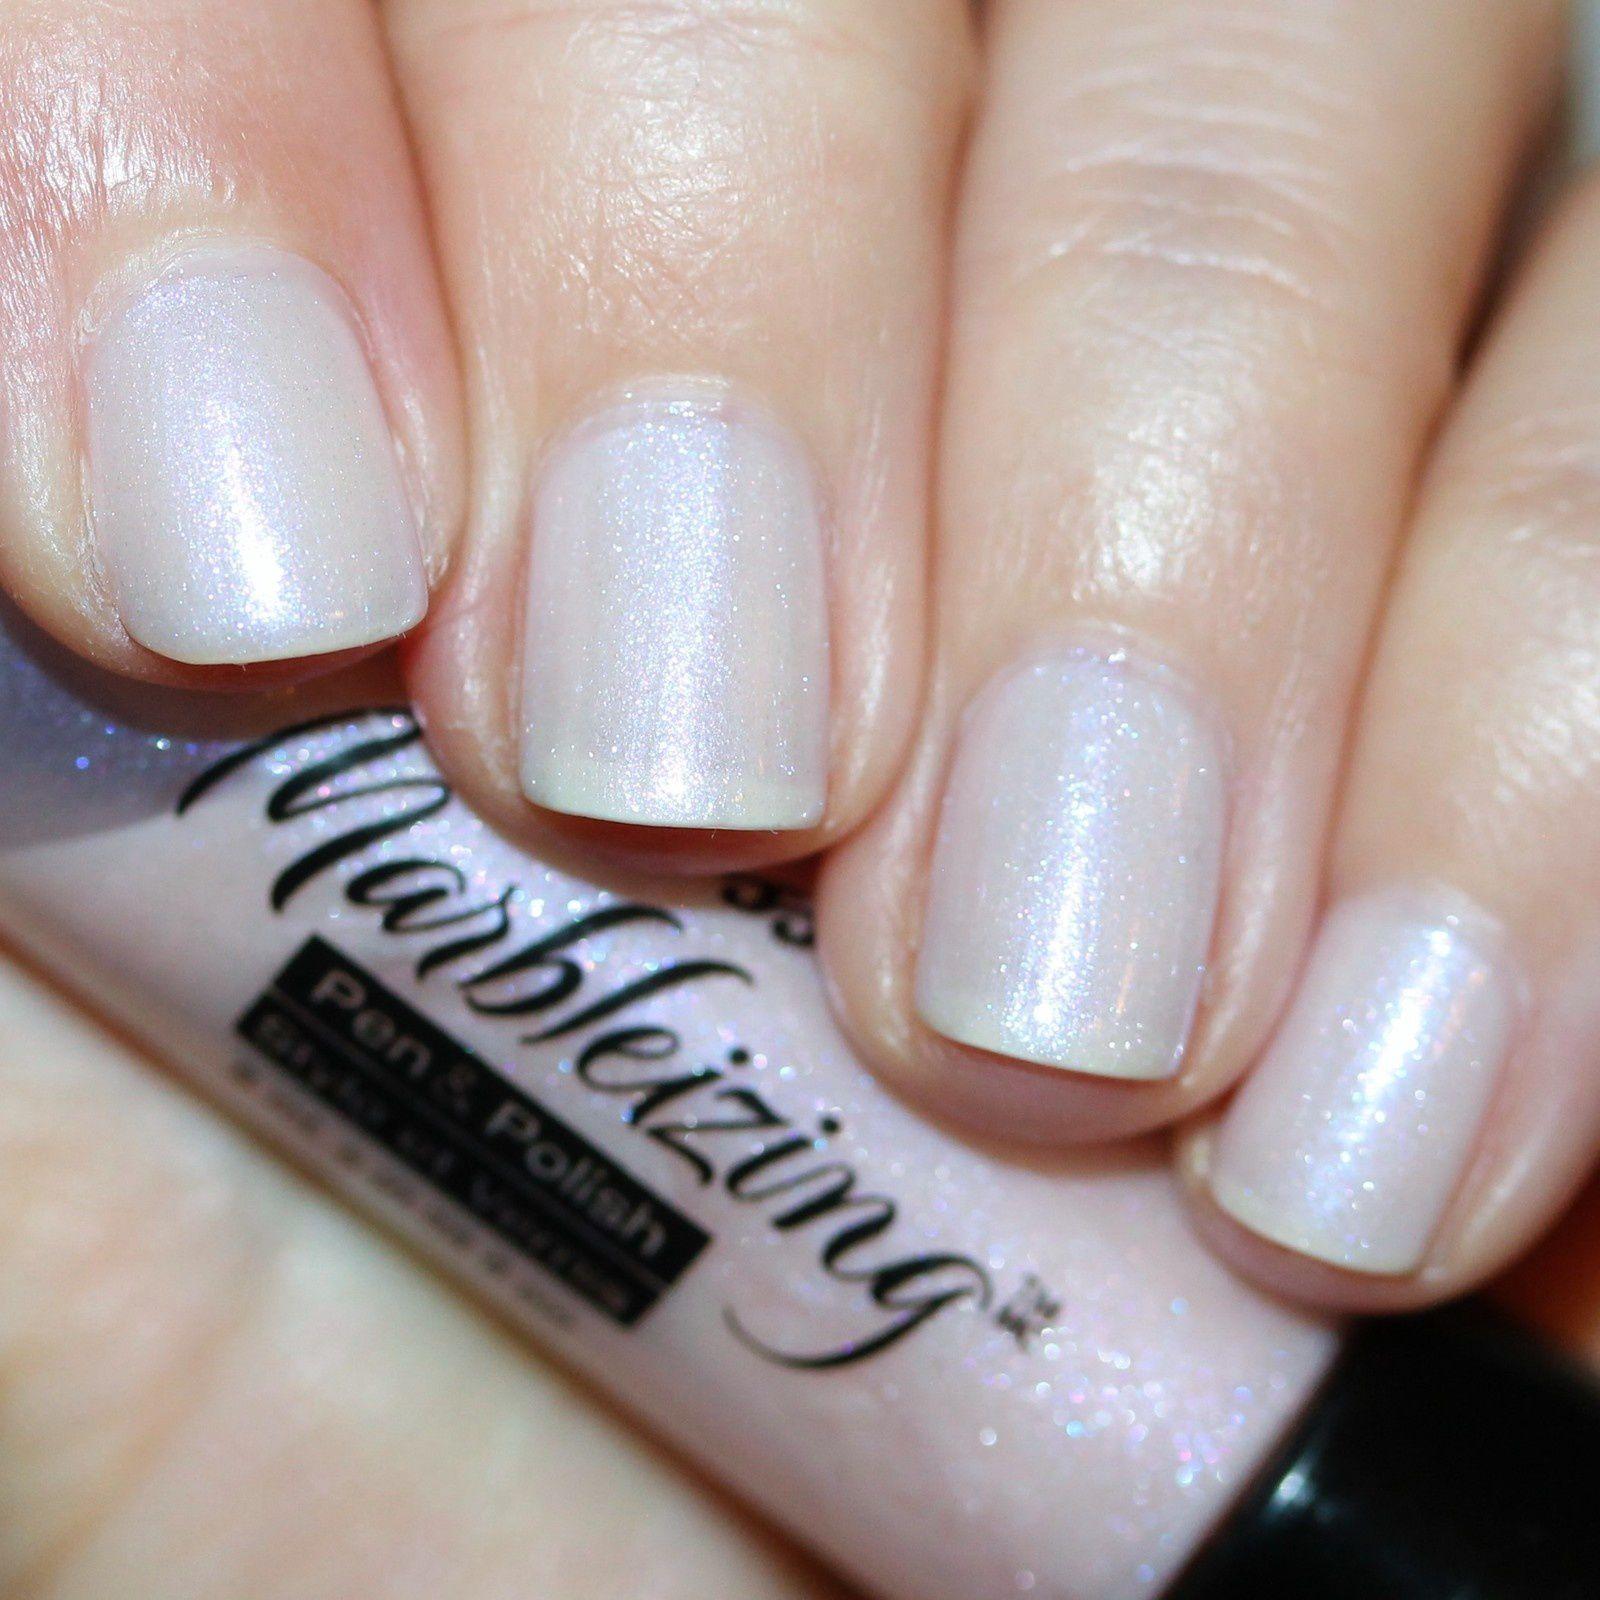 Essie Protein Base Coat / Kiss Nails Marbleizing Pen & Polish (Pastel Pink) / Essie Gel Top Coat